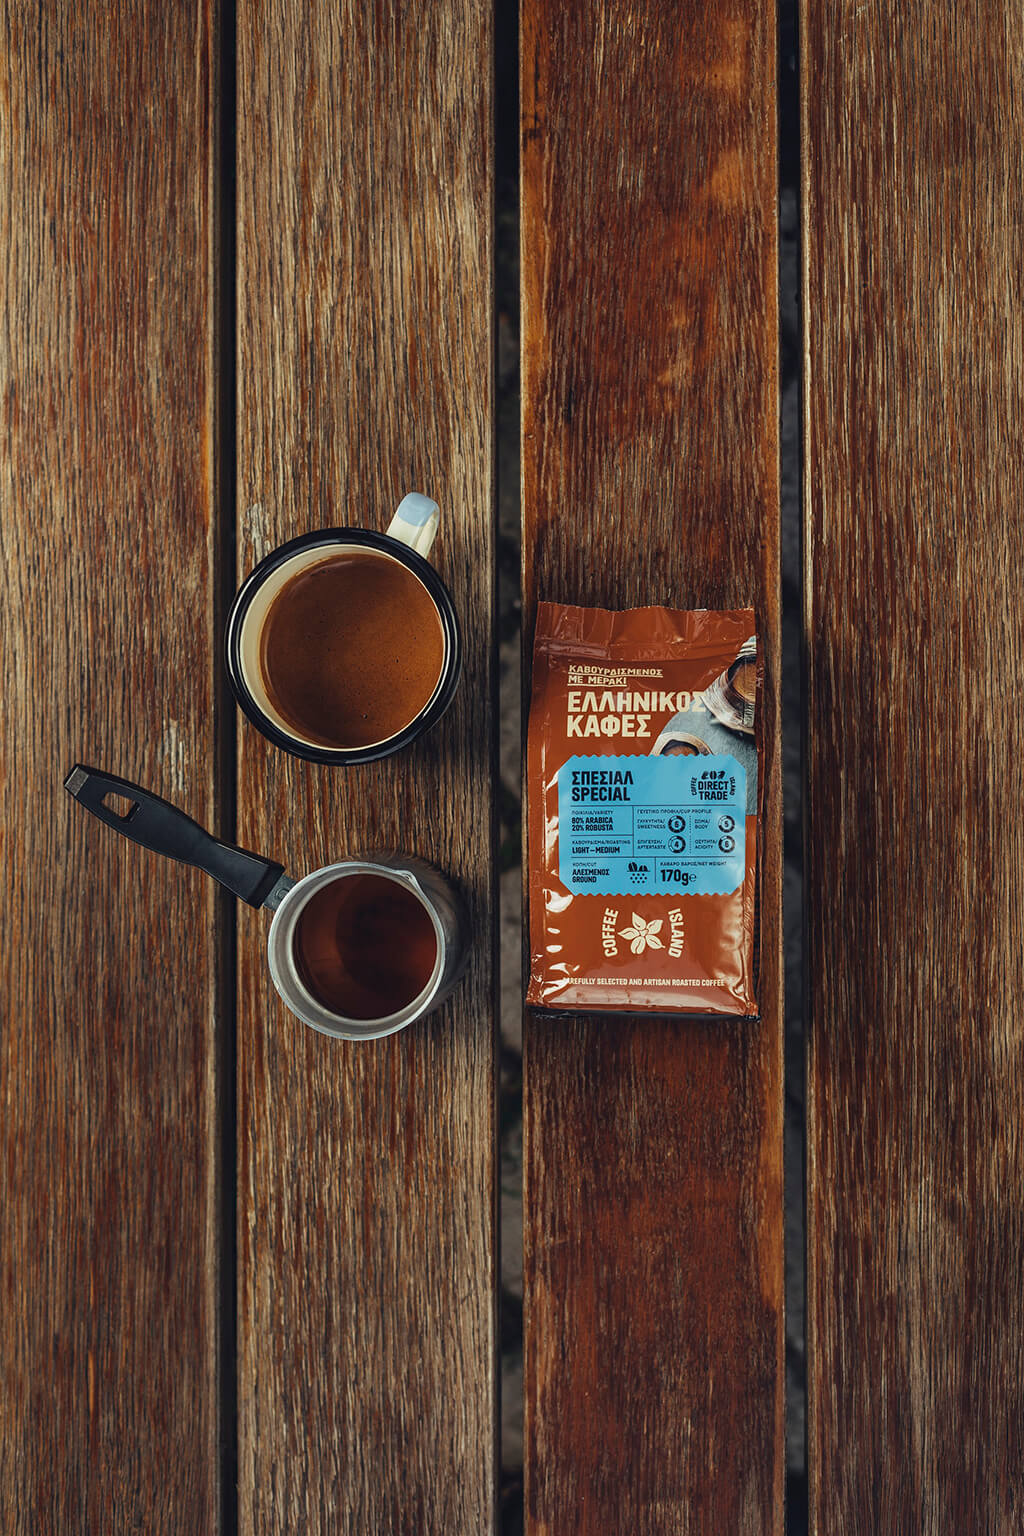 Coffee Island's special ibrik coffee.